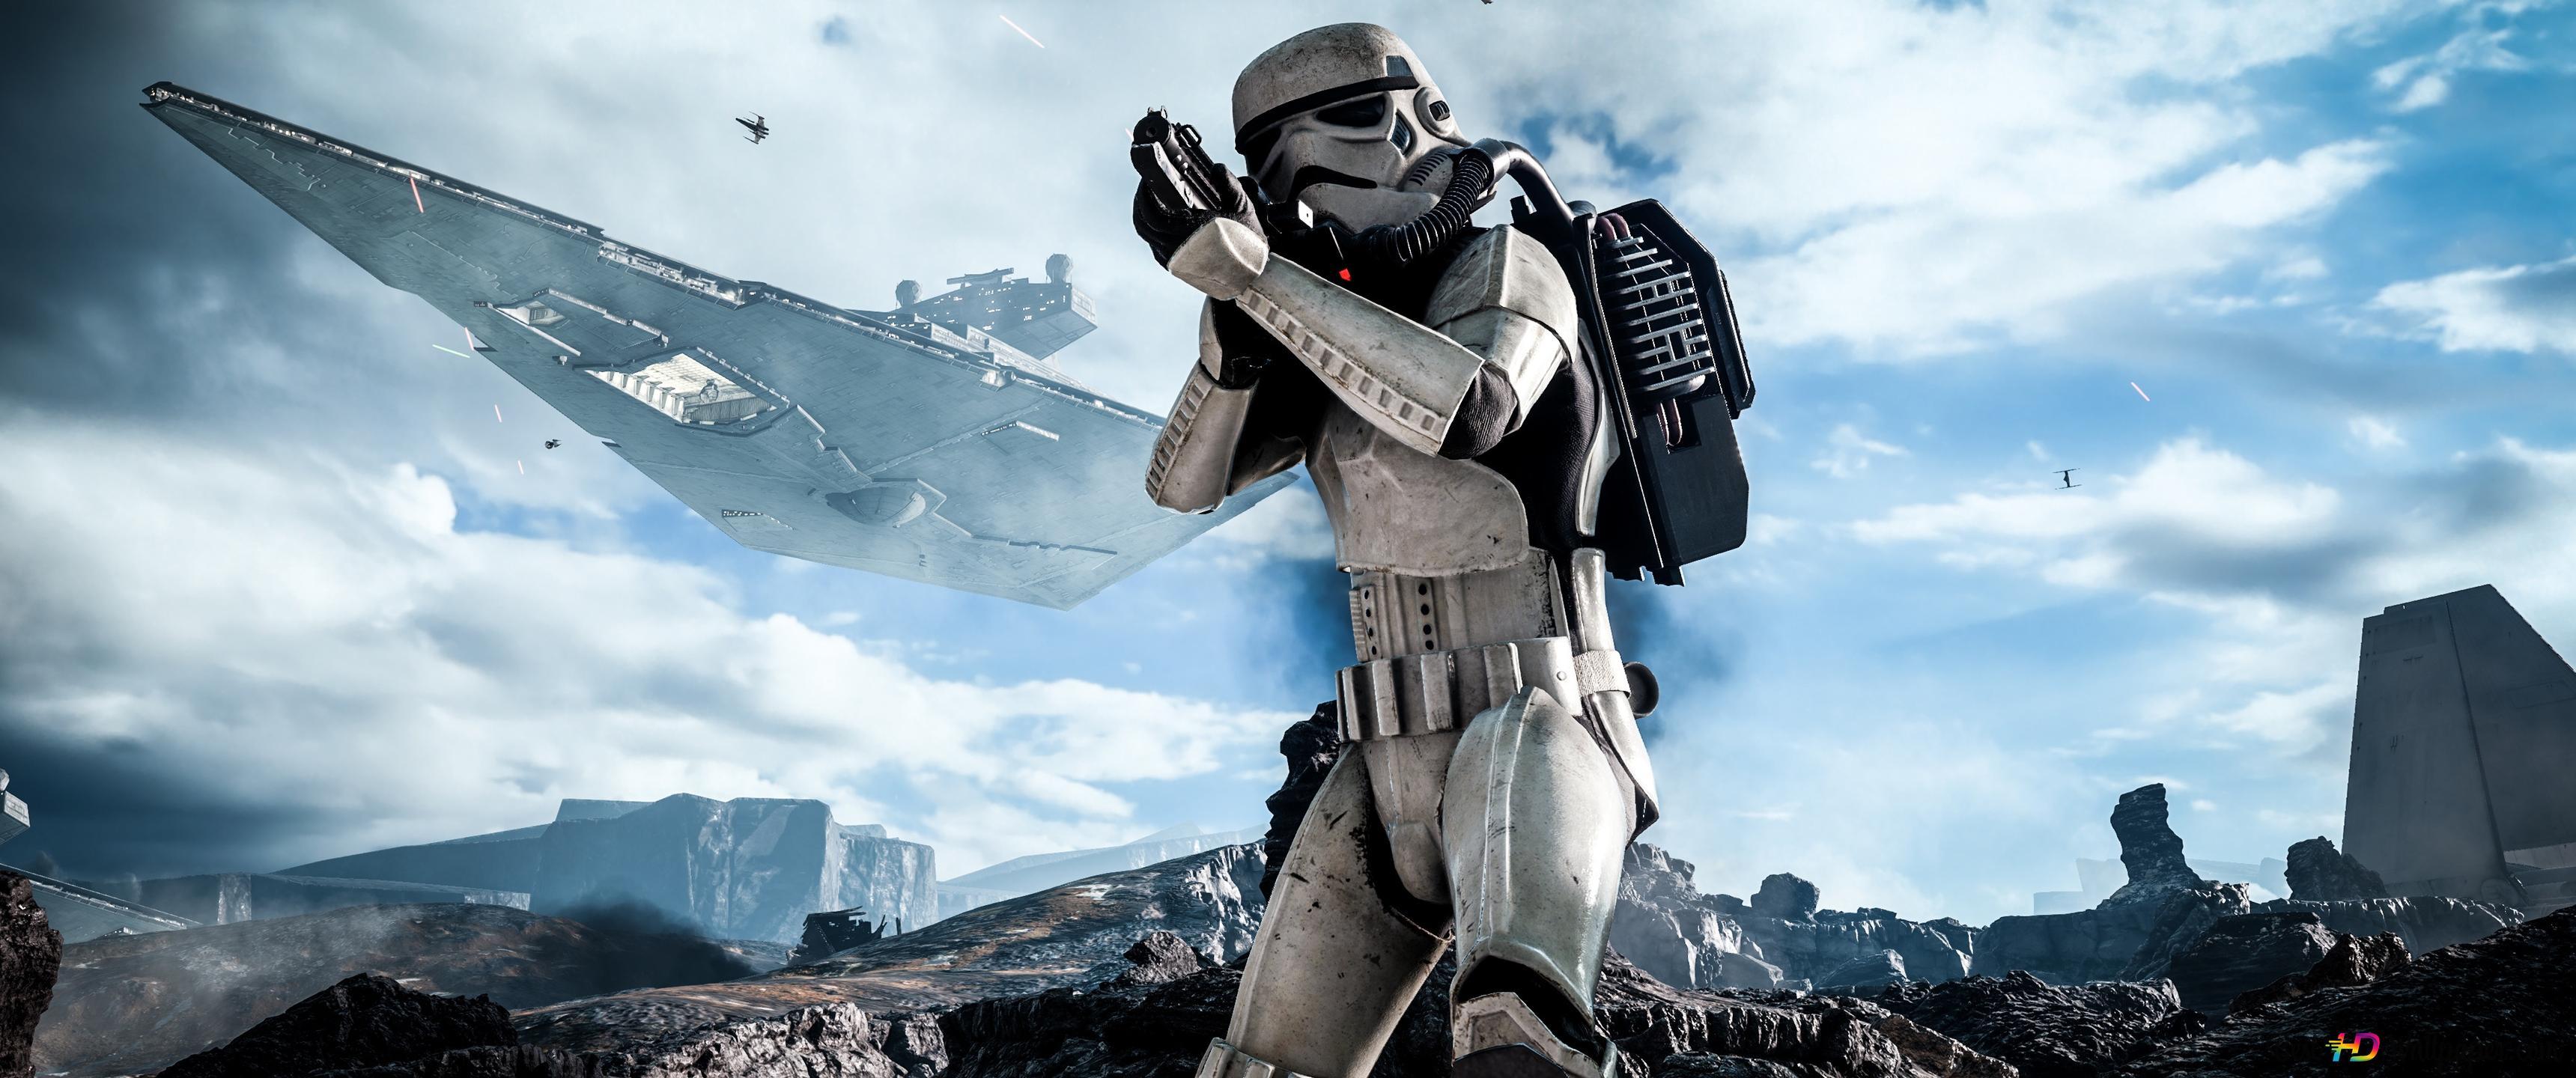 star wars battlefront stormtrooper wallpaper 3440x1440 11632 15